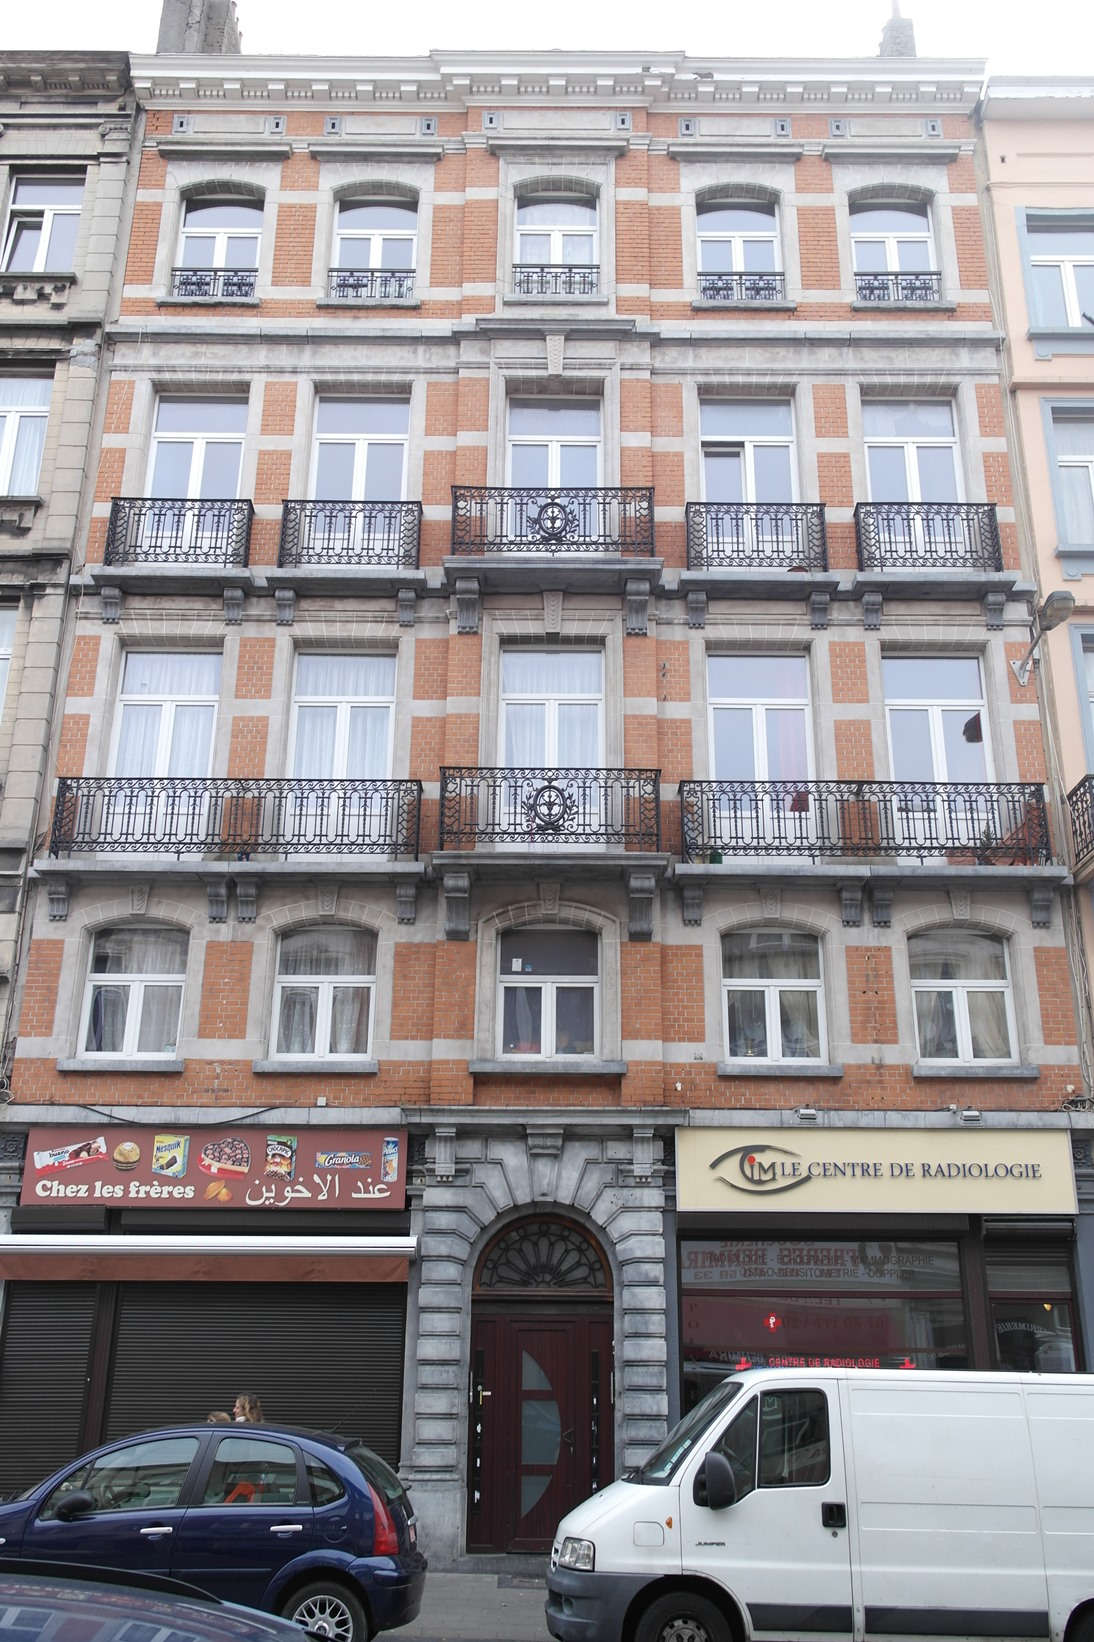 molenbeek saint jean rue du comte de flandre 61 63 65 hano g. Black Bedroom Furniture Sets. Home Design Ideas